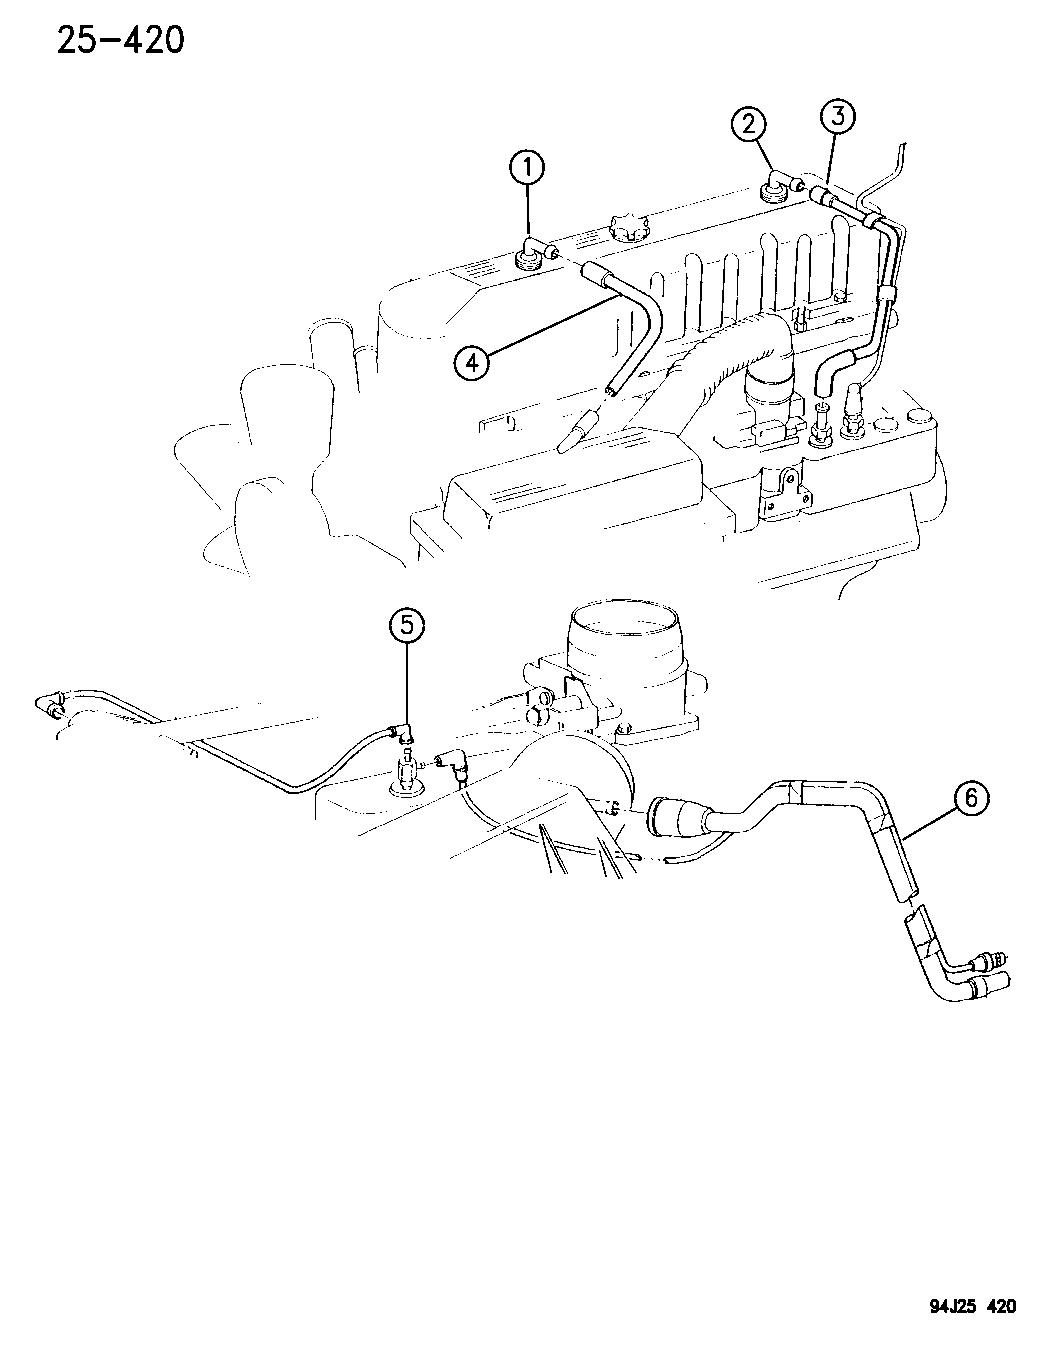 1994 Jeep Wrangler Emission Control Vacuum Harness Engine Diagram Thumbnail 2